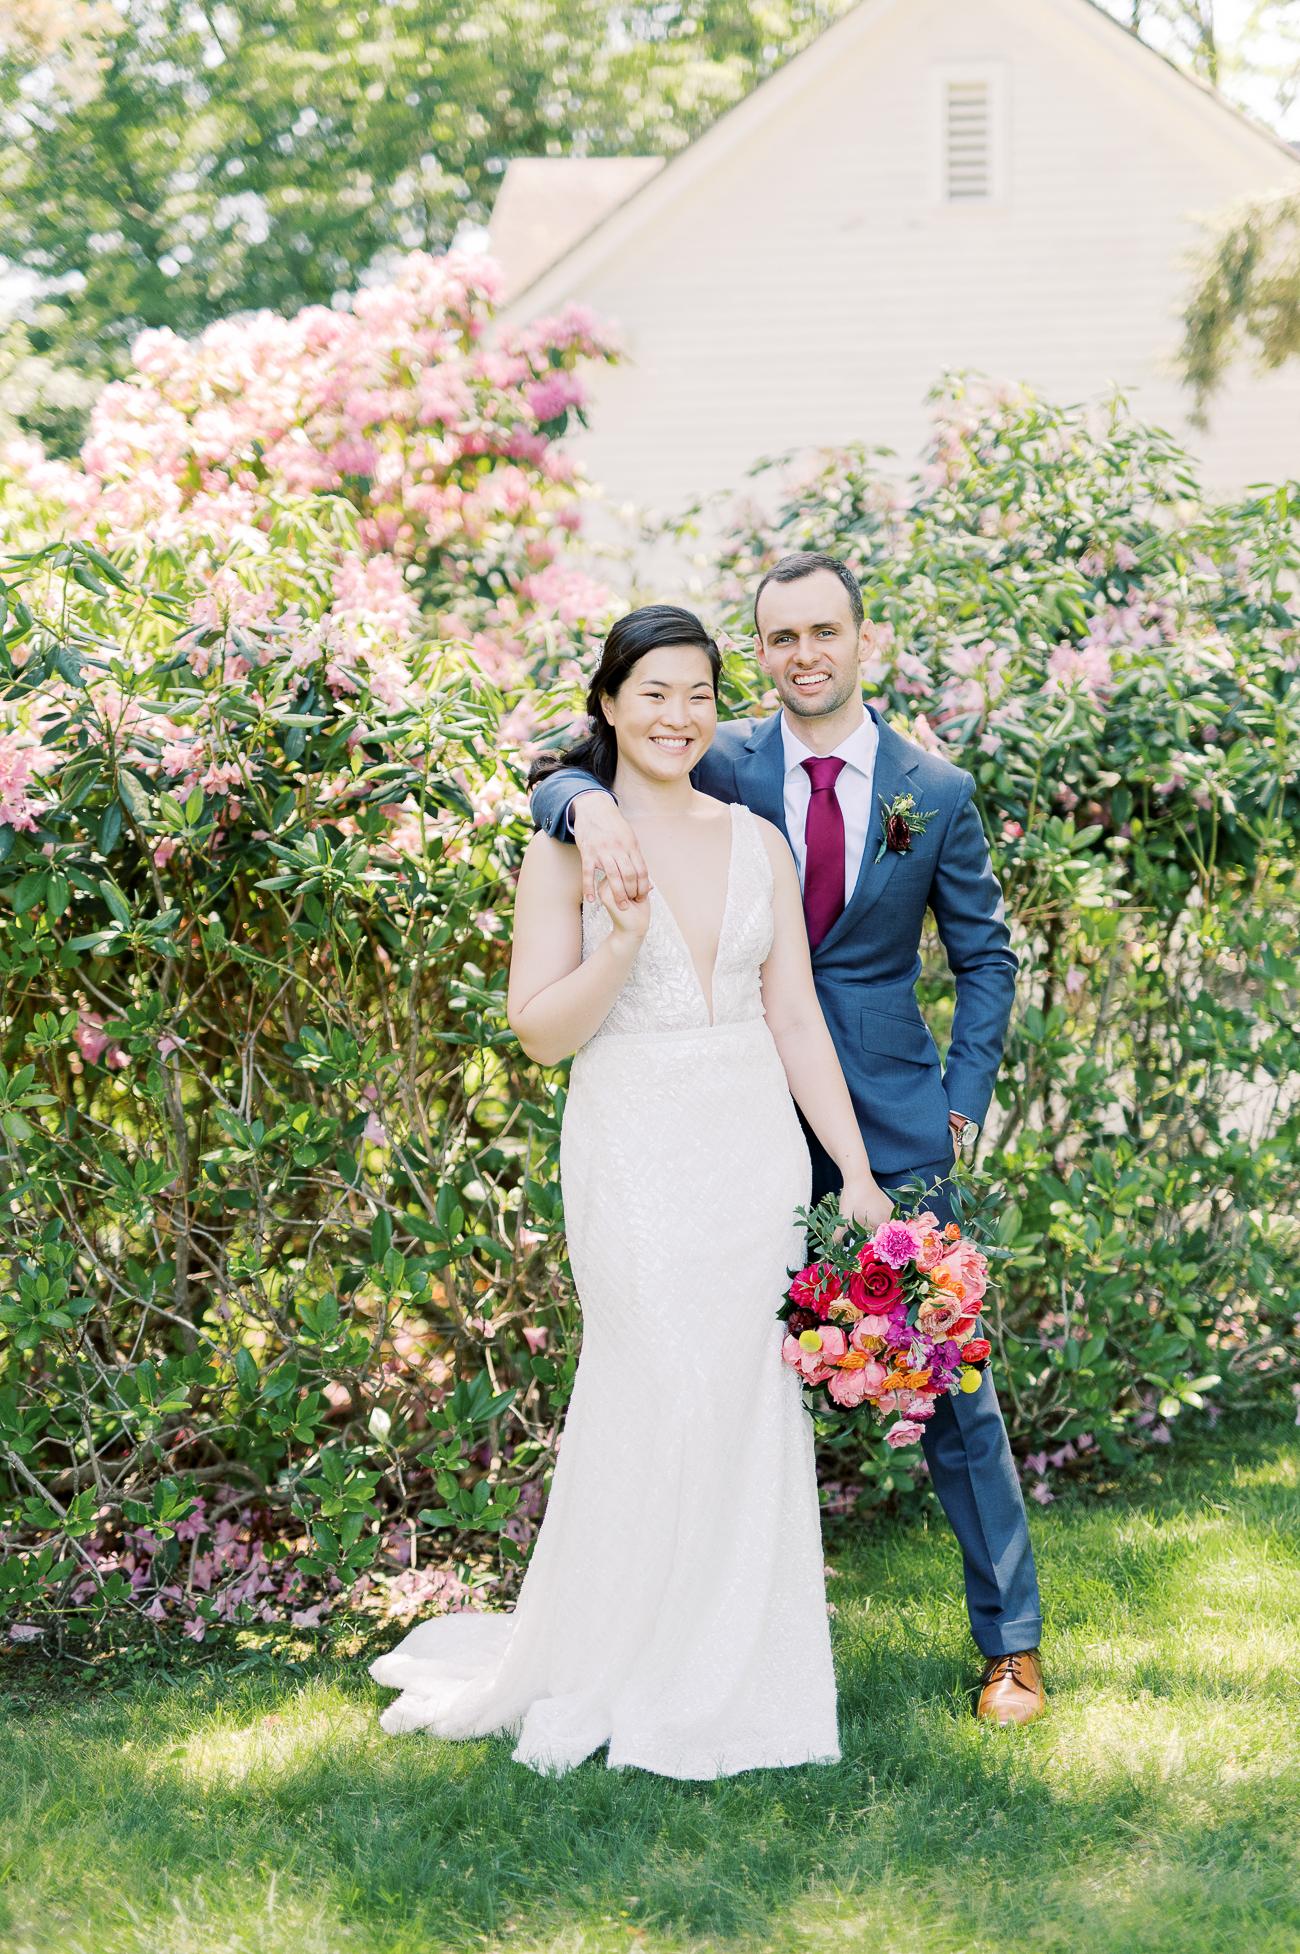 A TWOL WEDDING: Sarah & Justin Get Married!